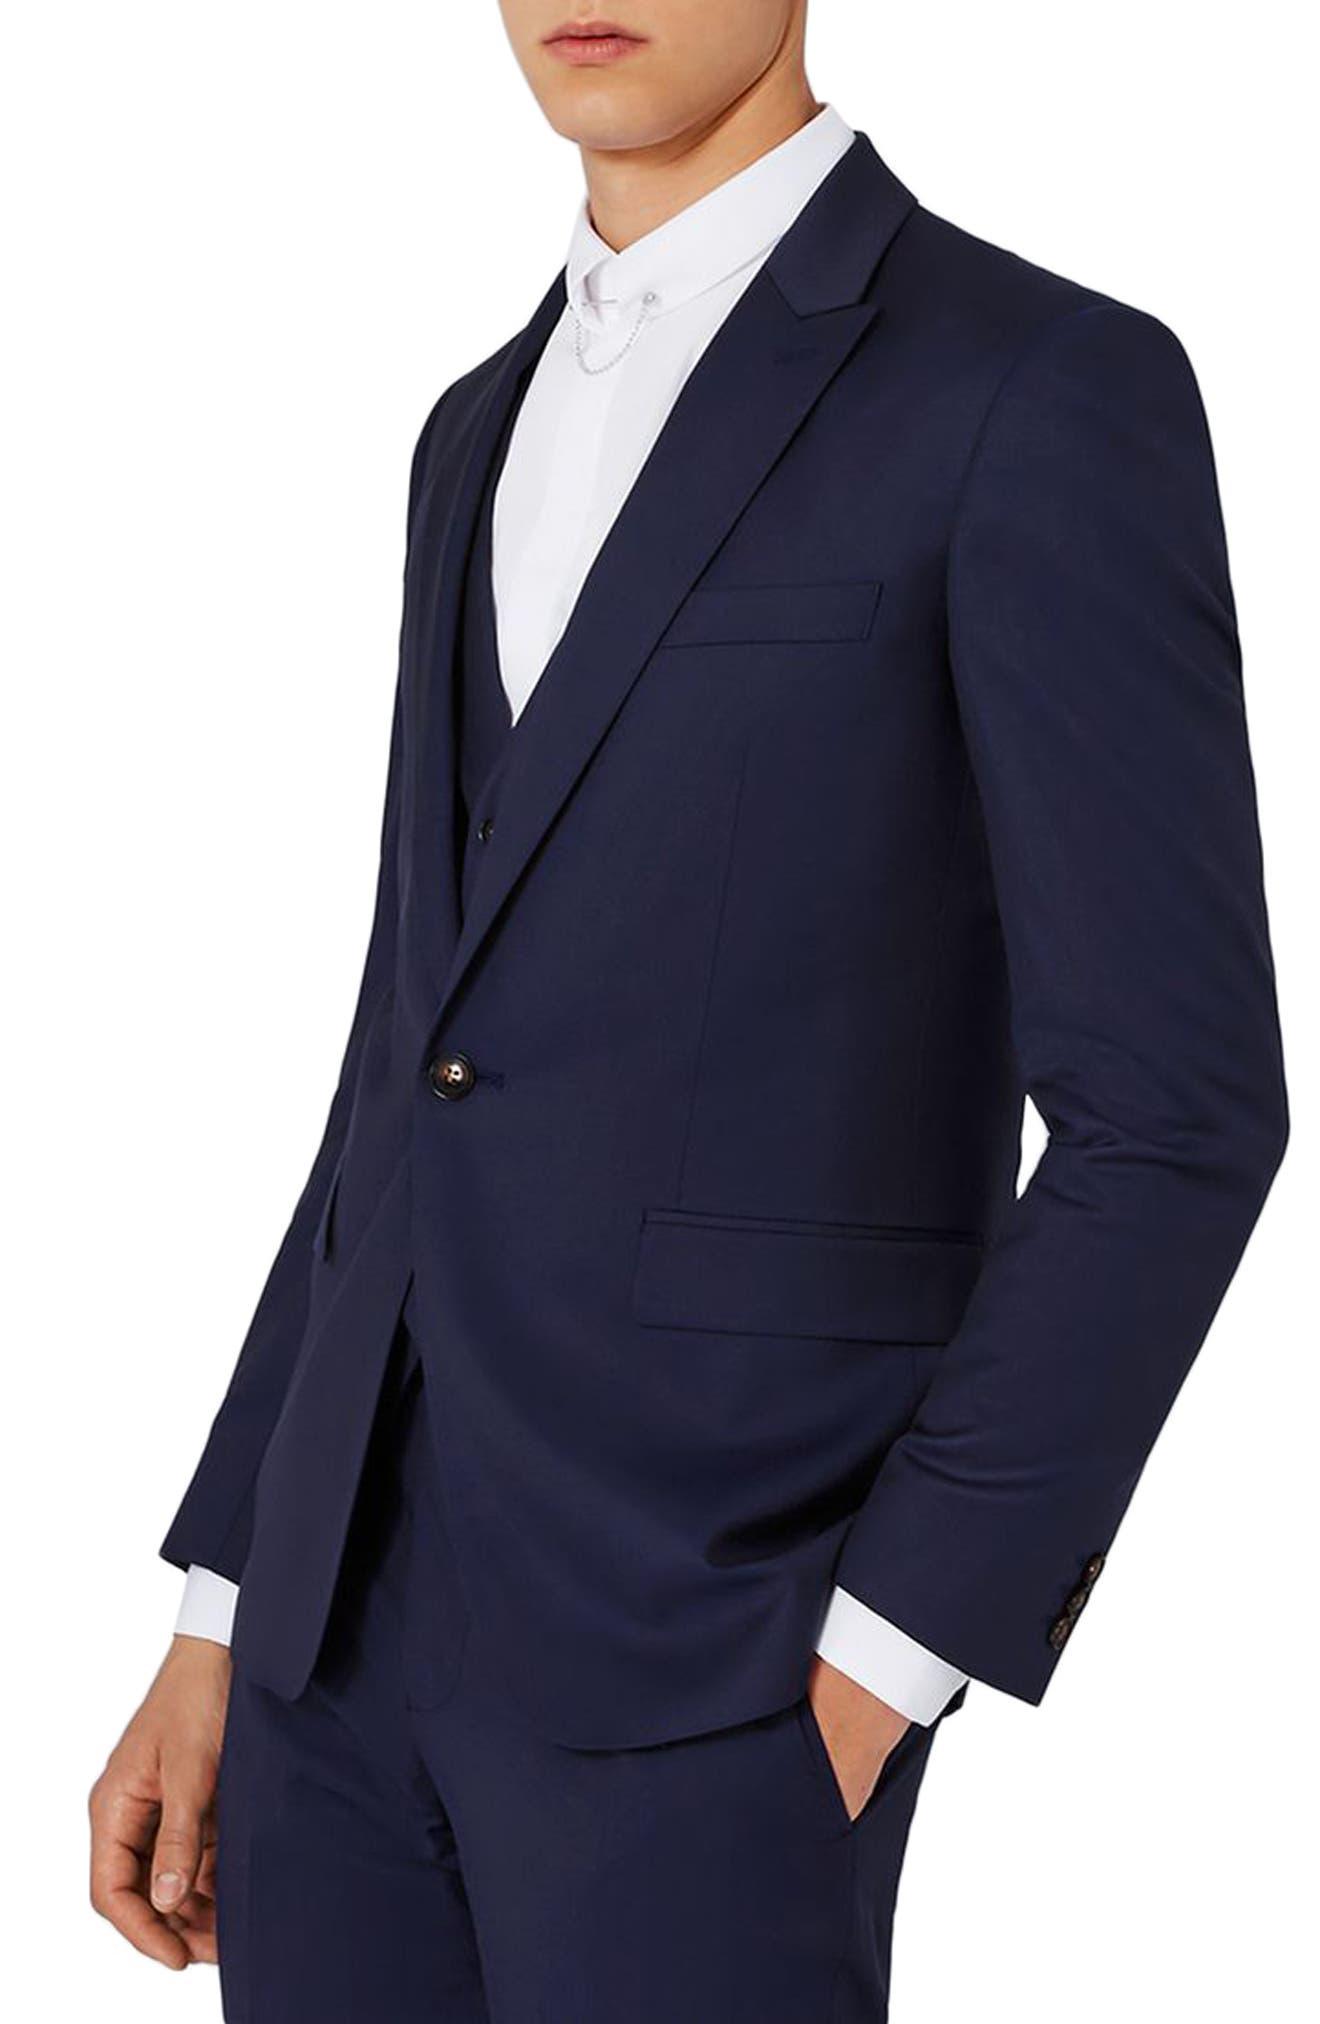 TOPMAN Charlie Casely-Hayford x Topman Skinny Fit Twill Suit Jacket